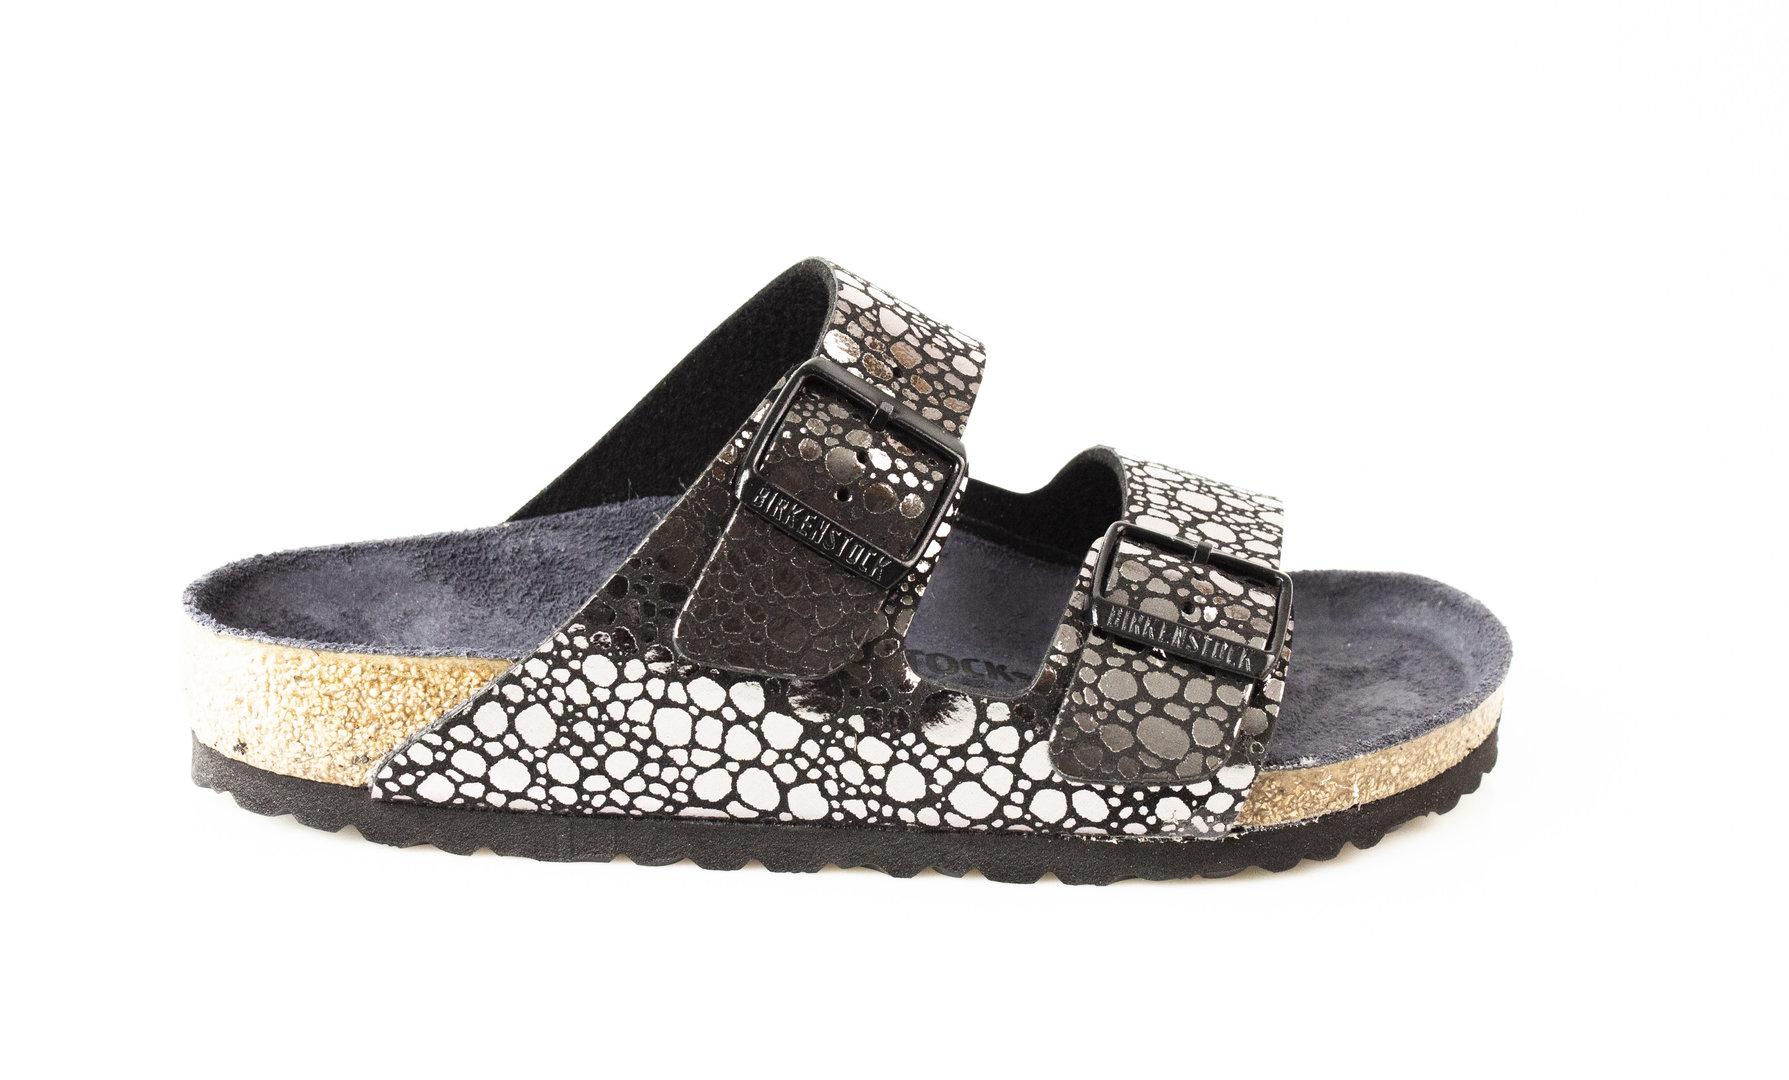 Birkenstock Damen Arizona BF 1008871 metallic stones black